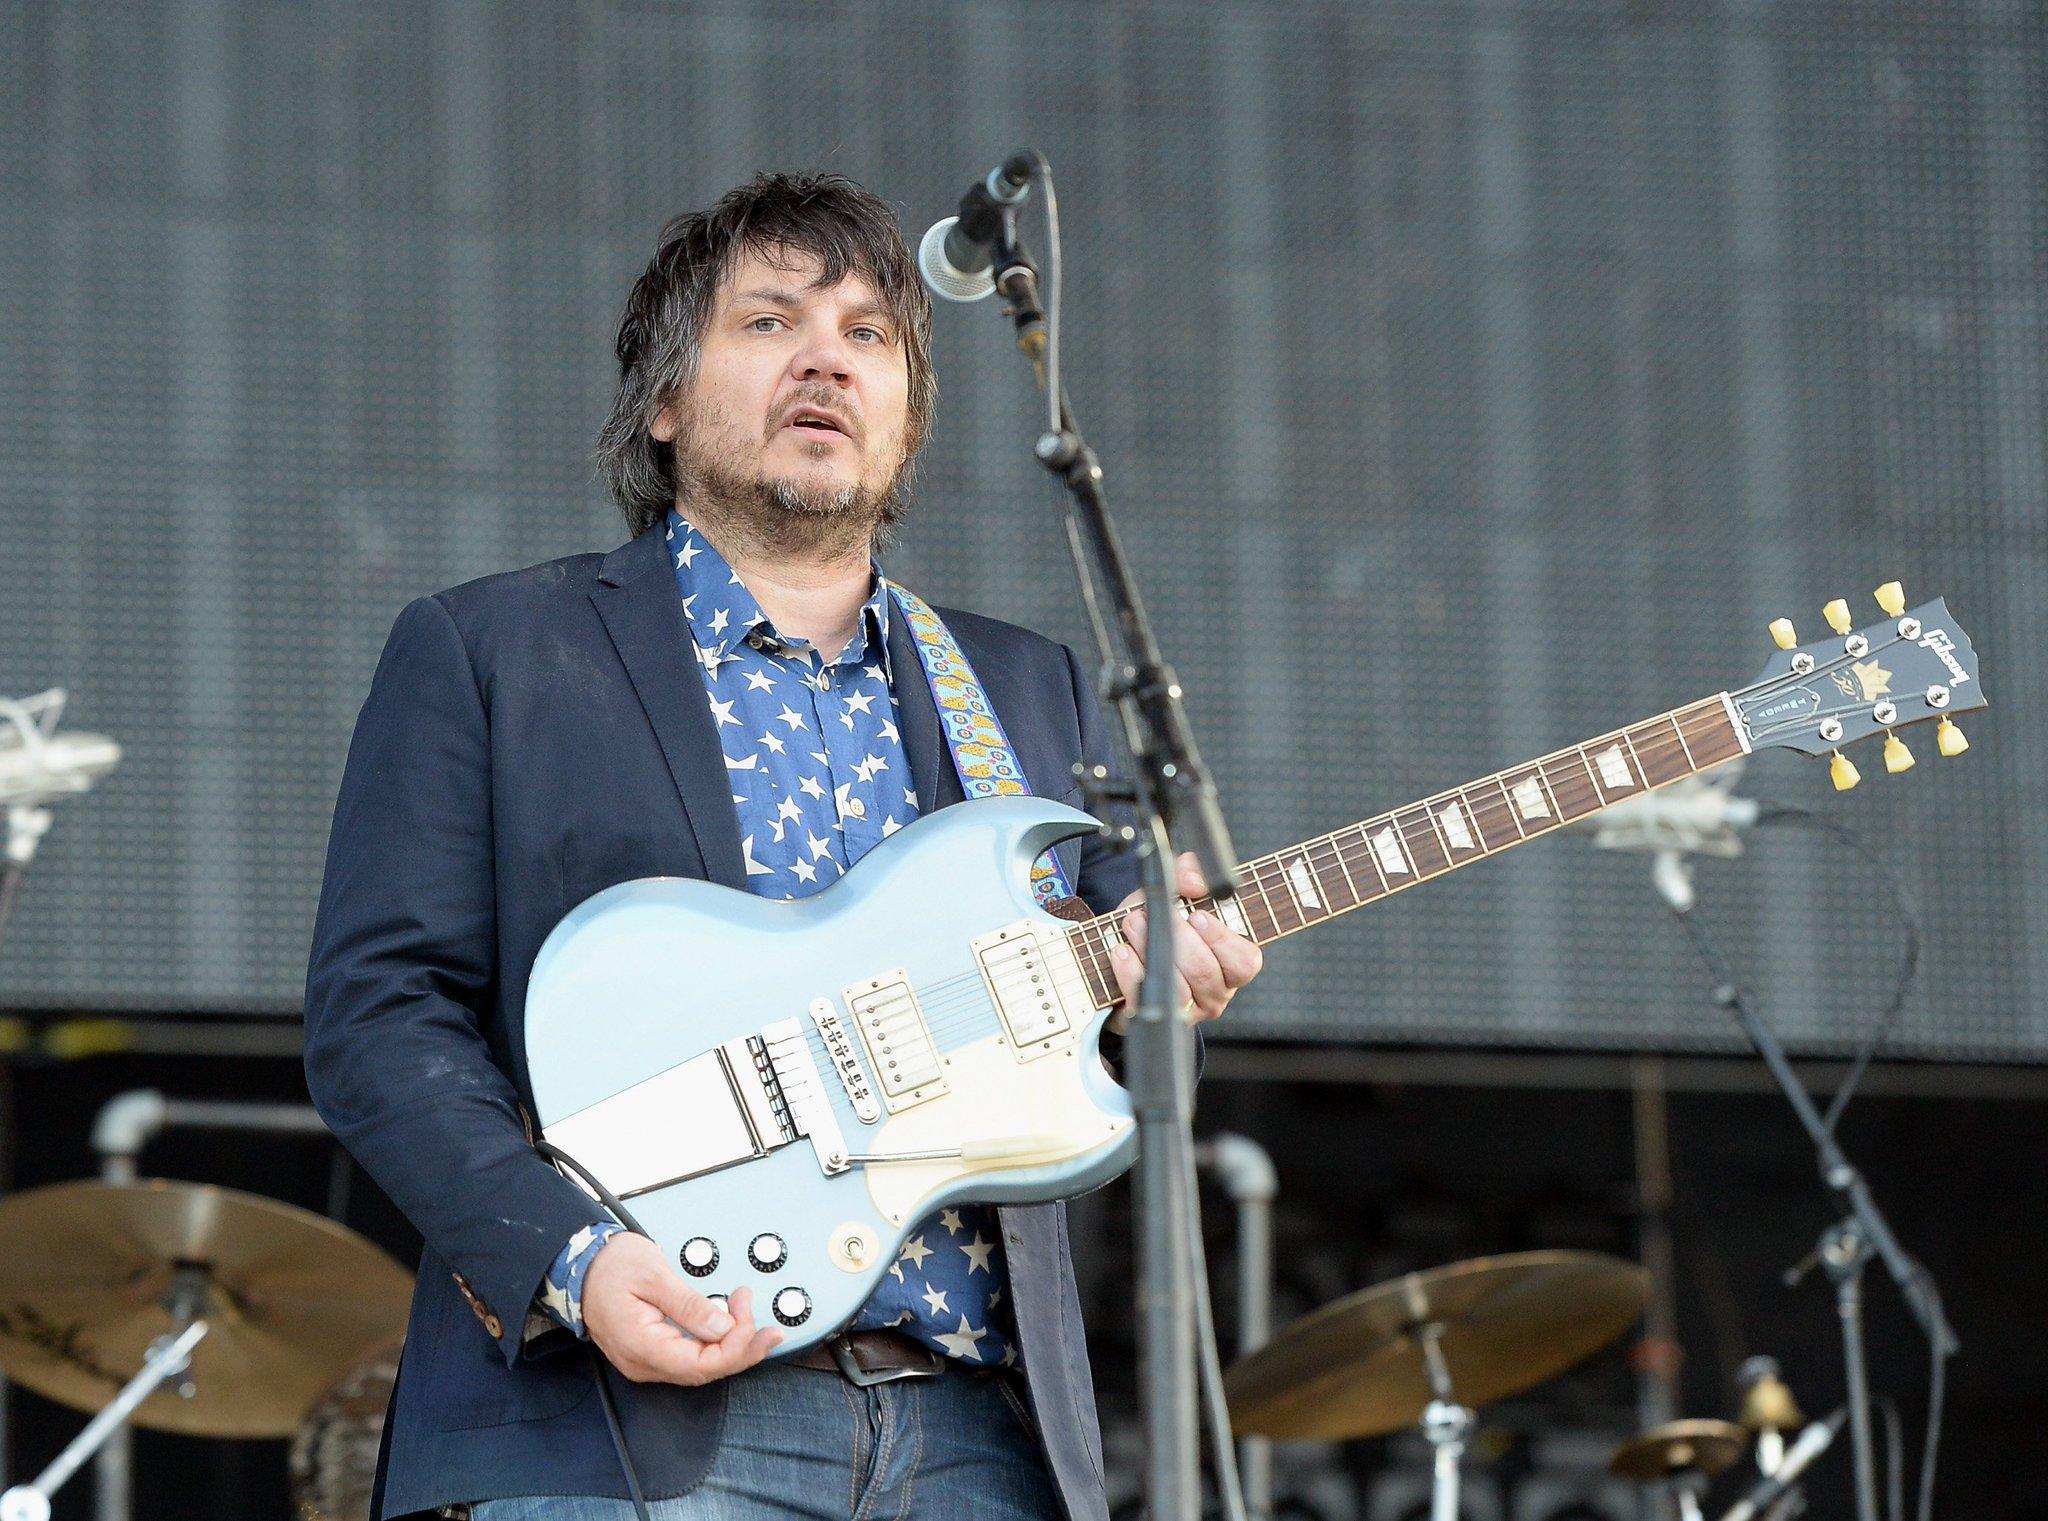 Wilco selling $1200 box set, axe https://t.co/fcnJsTP4cY https://t.co/FcSUdWN4kV